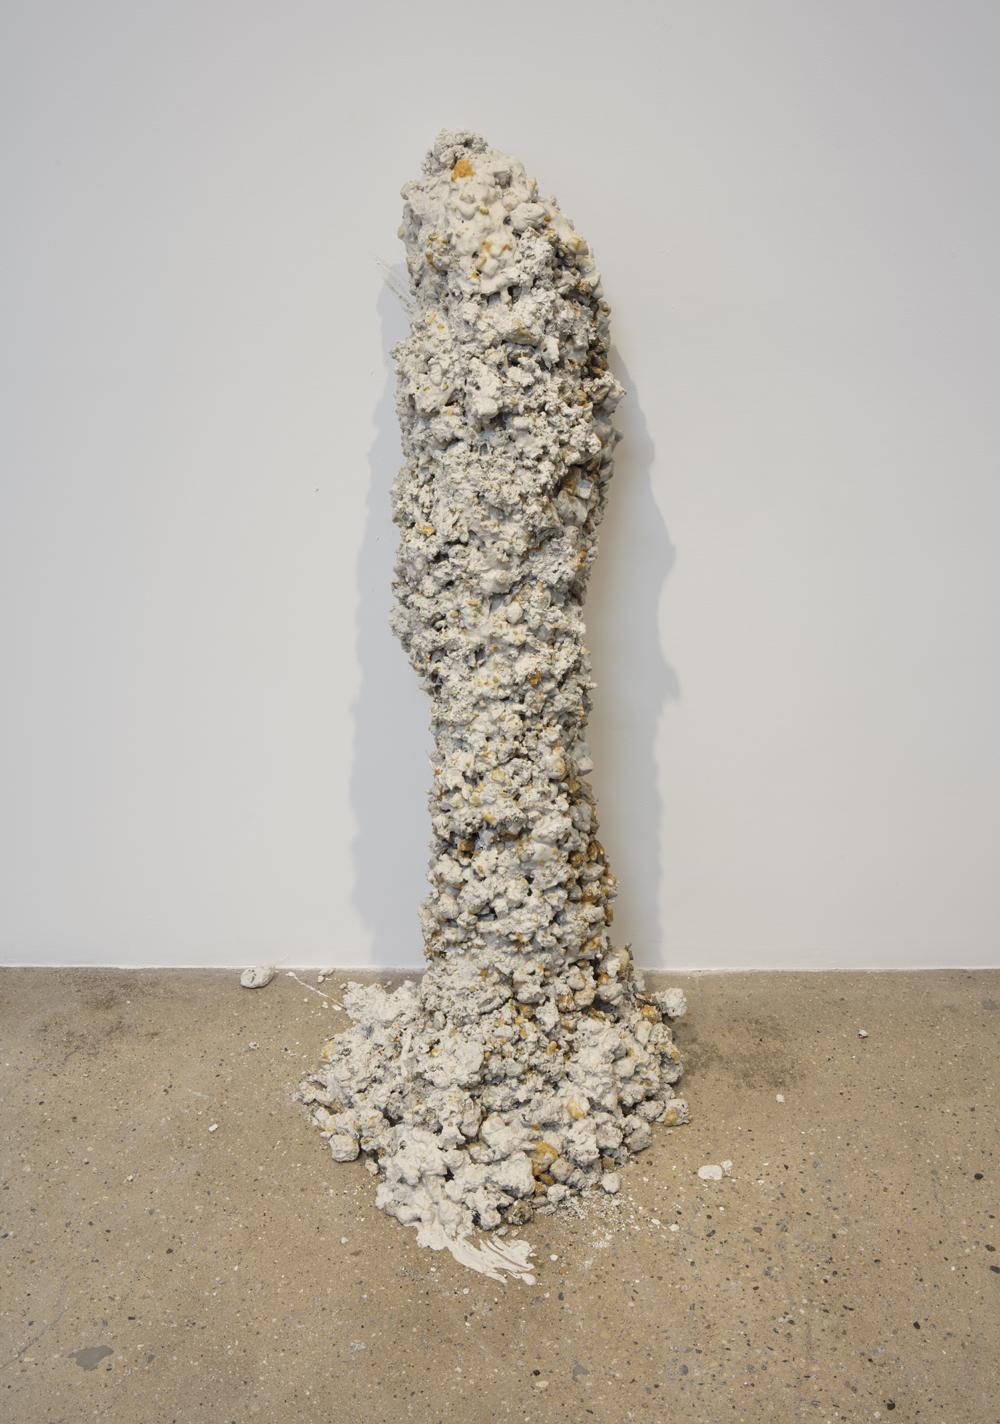 Pablo Rasgado, Horizon, Steve Turner, Steve Turner Los Angeles, Steve Turner Contemporary, Installation art, Mexico City